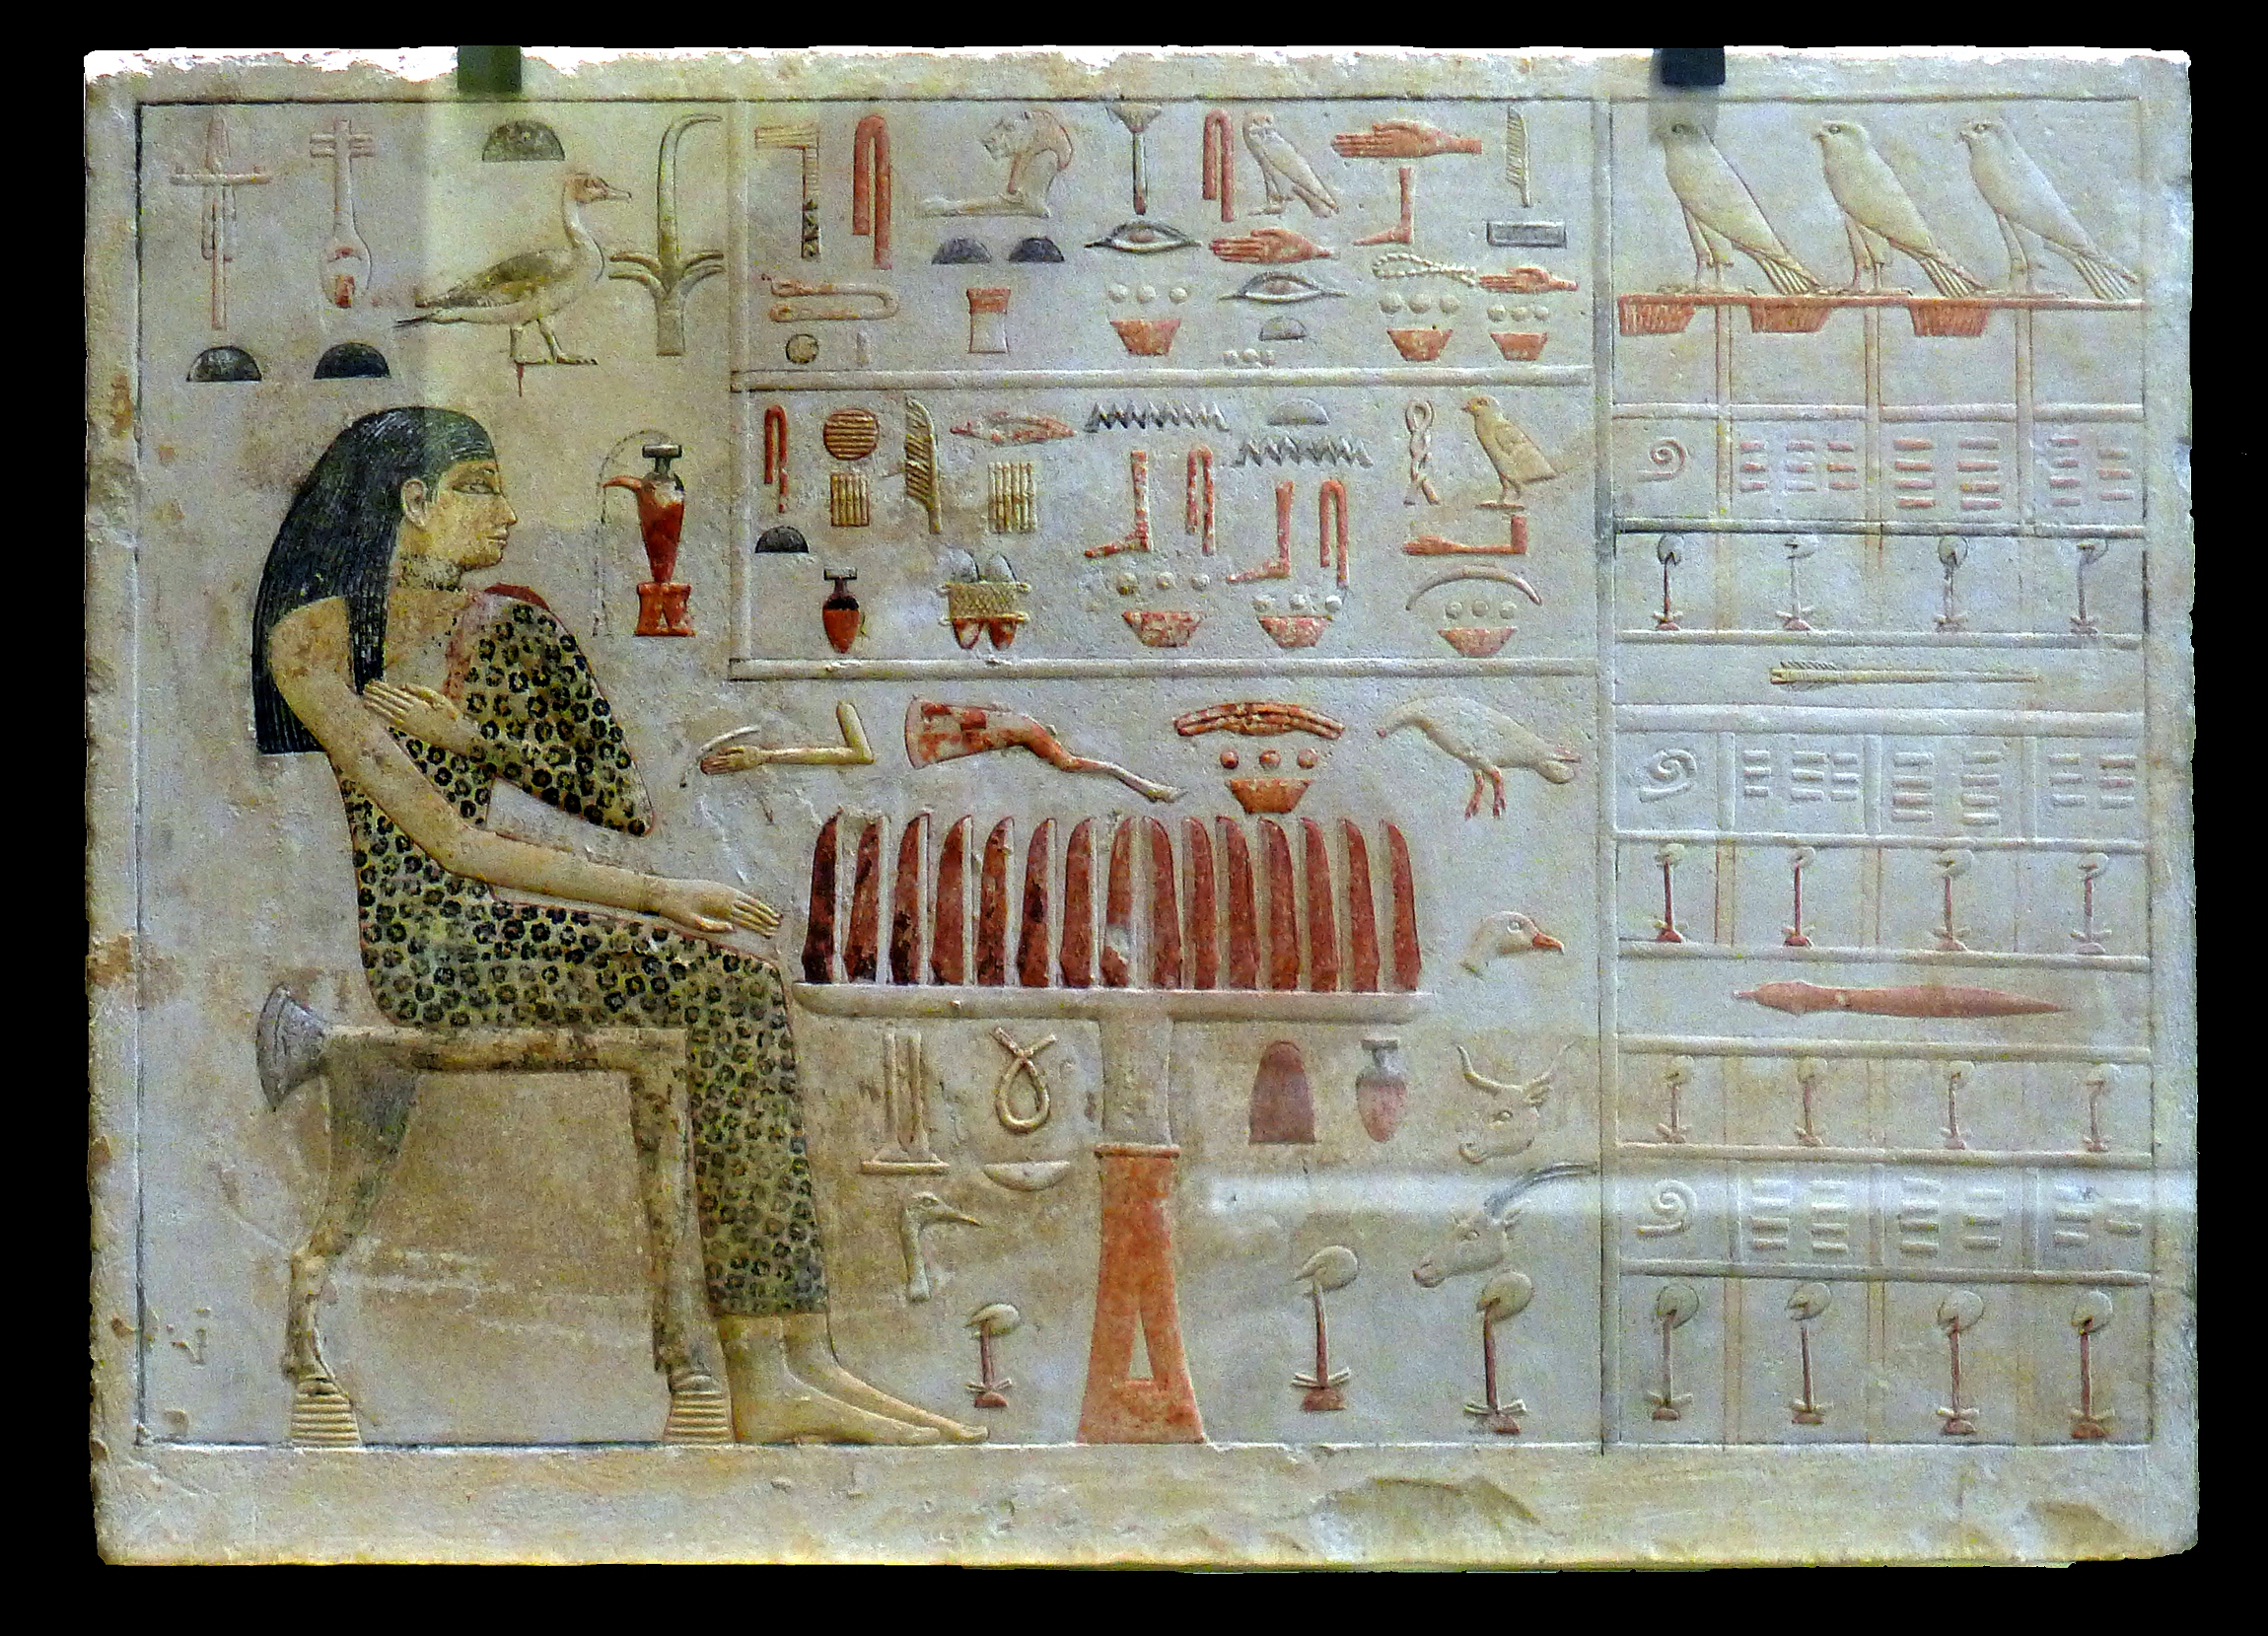 http://upload.wikimedia.org/wikipedia/commons/6/68/P1060243_Louvre_repas_fun%C3%A9raire_de_la_princesse_Nefertiabet_E15591_rwk.JPG